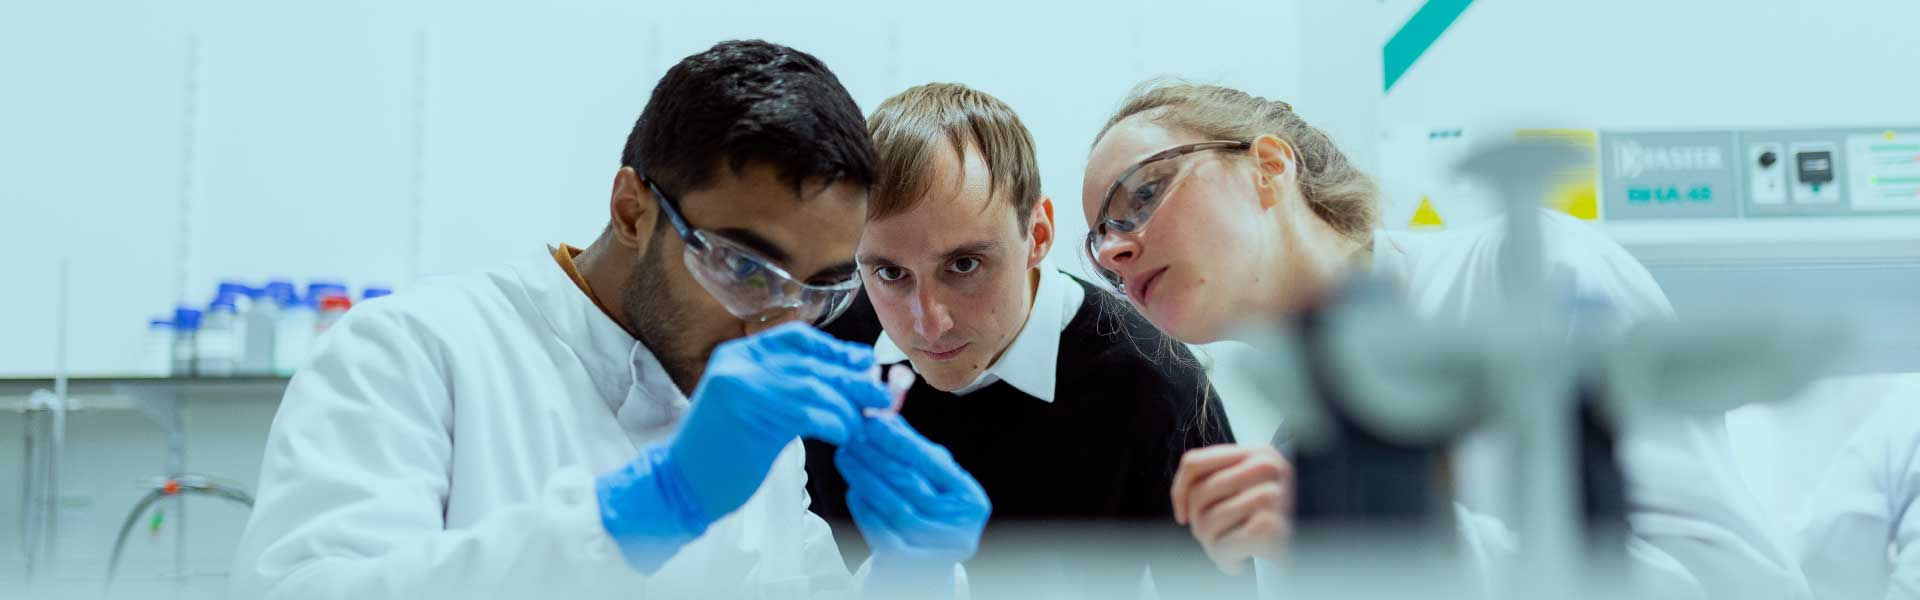 Equipe de laboratoire